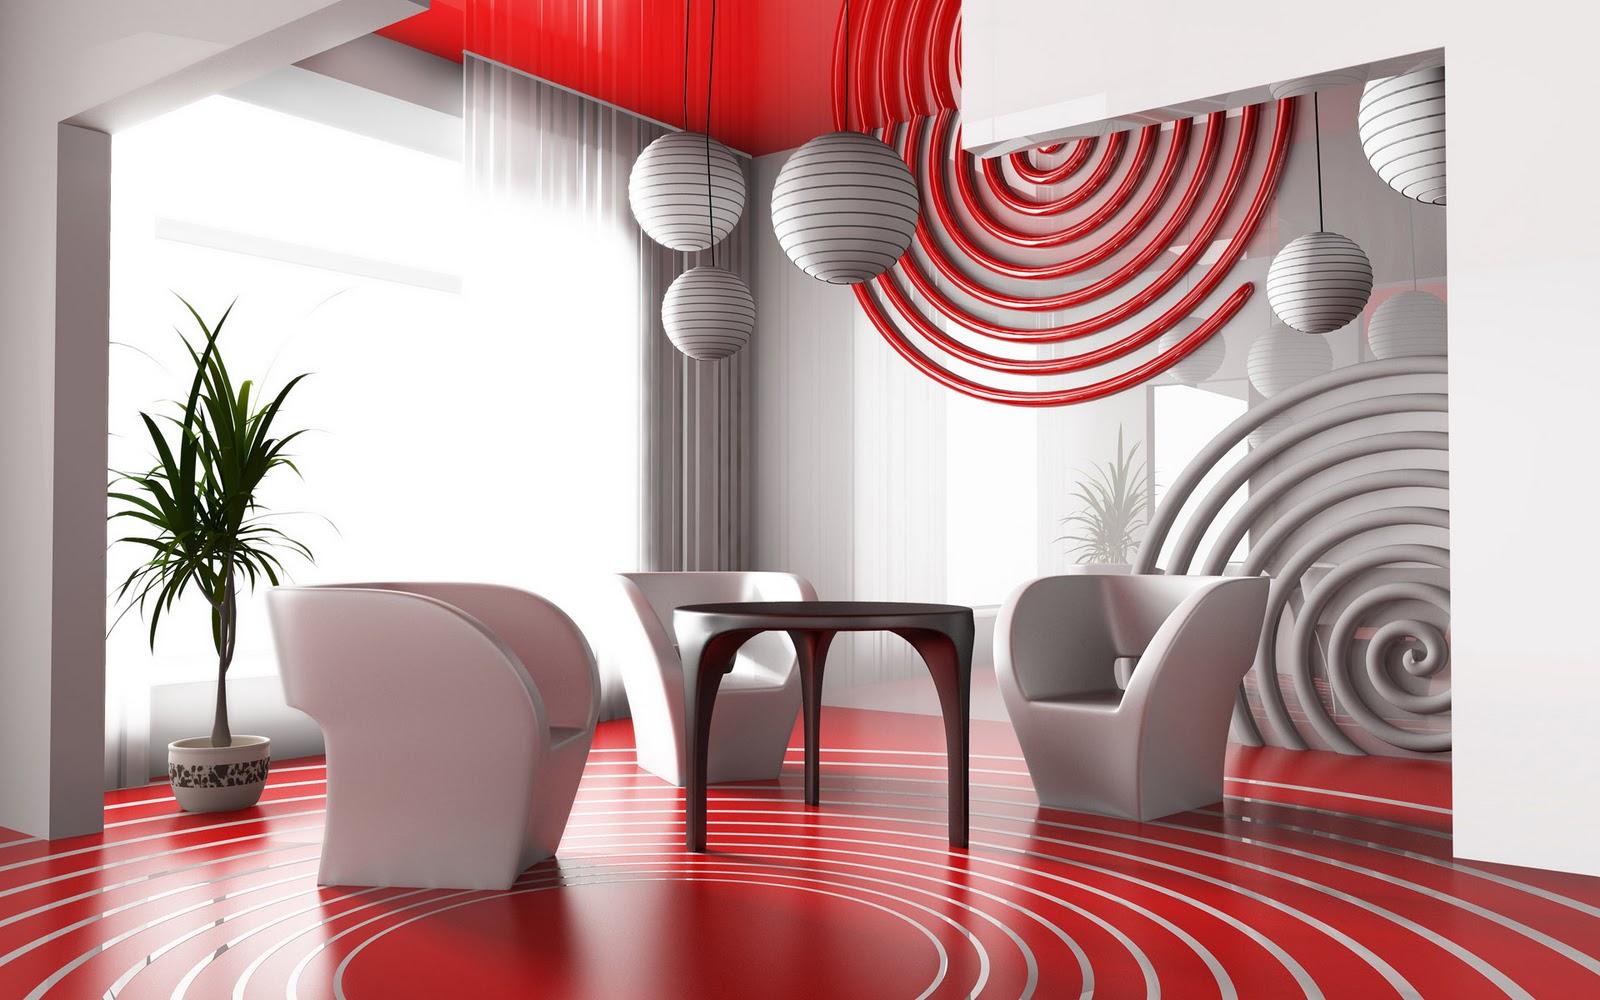 http://2.bp.blogspot.com/-tdh9KjrEqmA/Tvv-vmTFF1I/AAAAAAAAAvw/BahW61NORw4/s1600/interior_futuristic_living_room_012345_.jpg